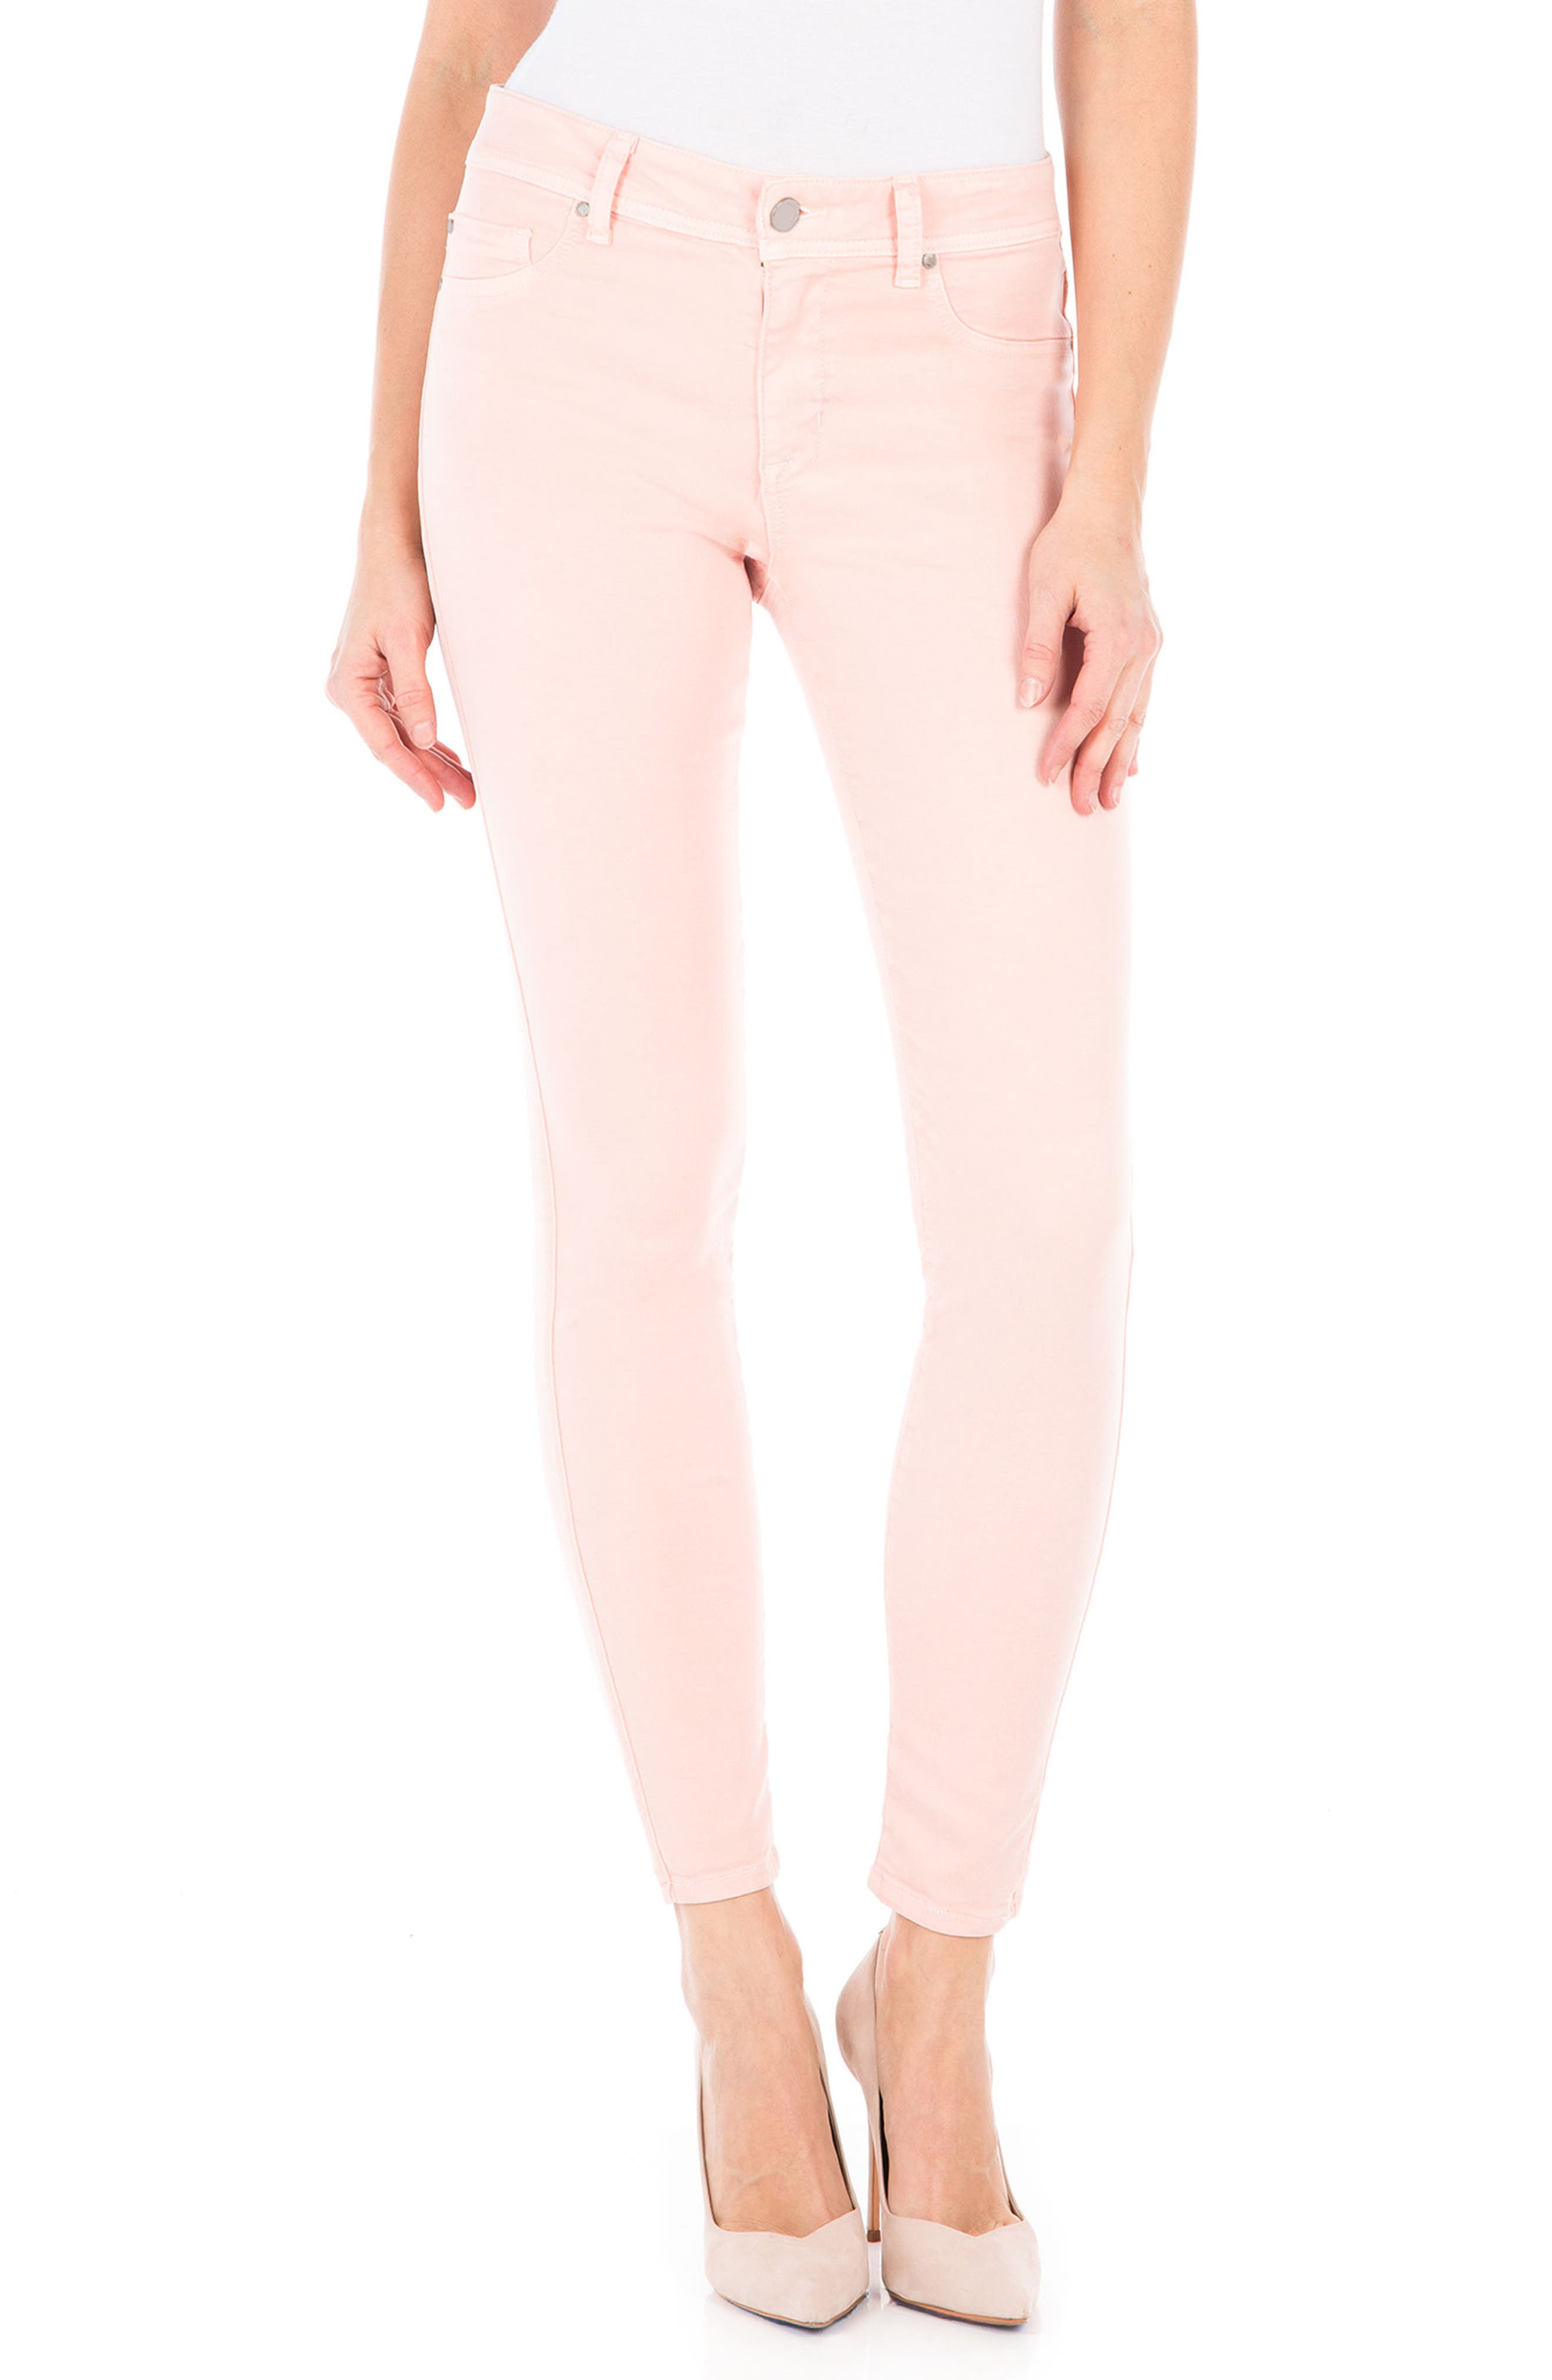 Alternate Image 1 Selected - Fidelity Denim Sola Skinny Jeans (Dusty Rose)